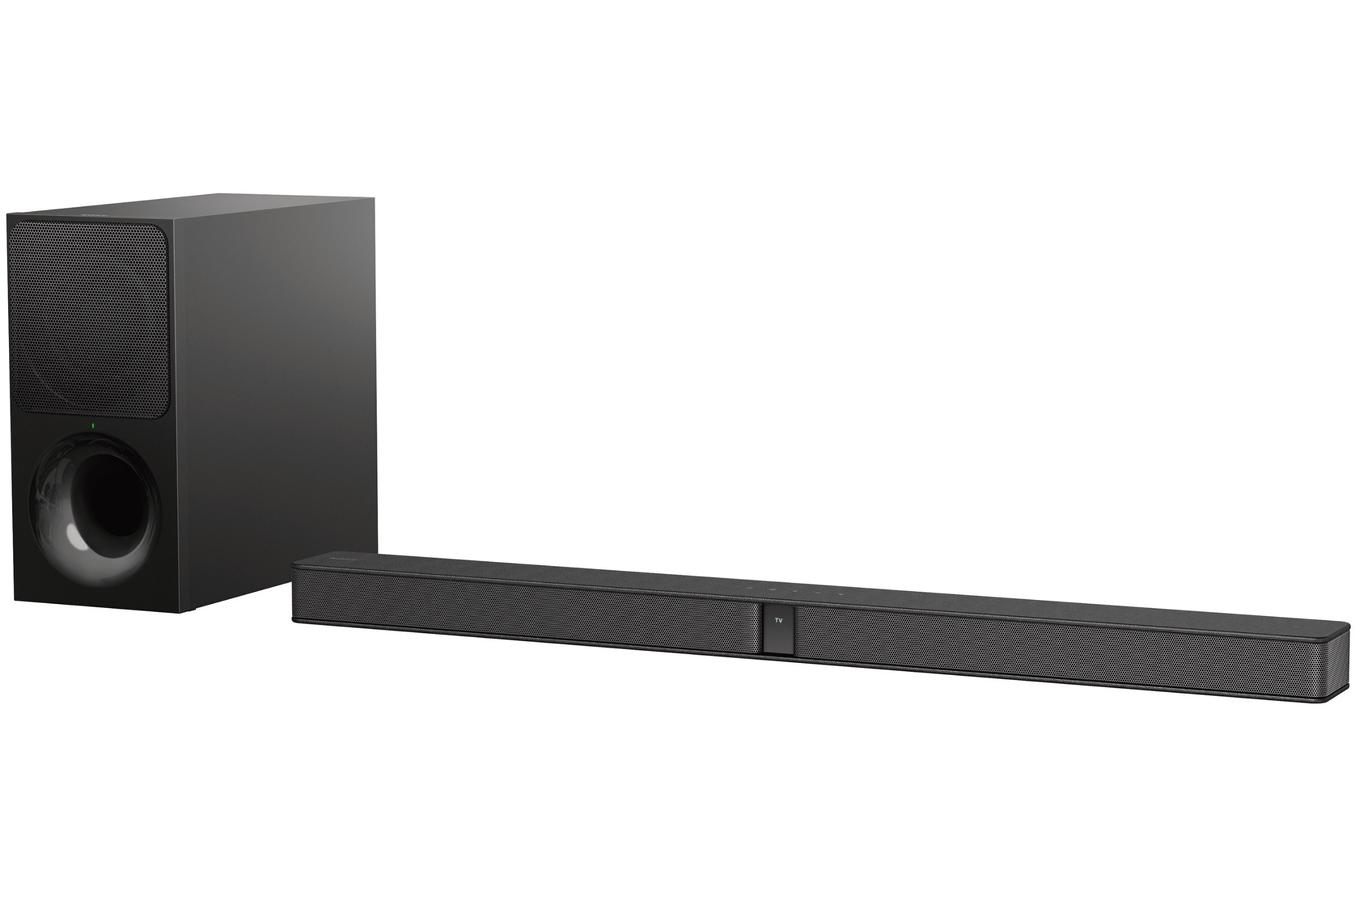 barre de son sony htct290 noir 4299574 darty. Black Bedroom Furniture Sets. Home Design Ideas